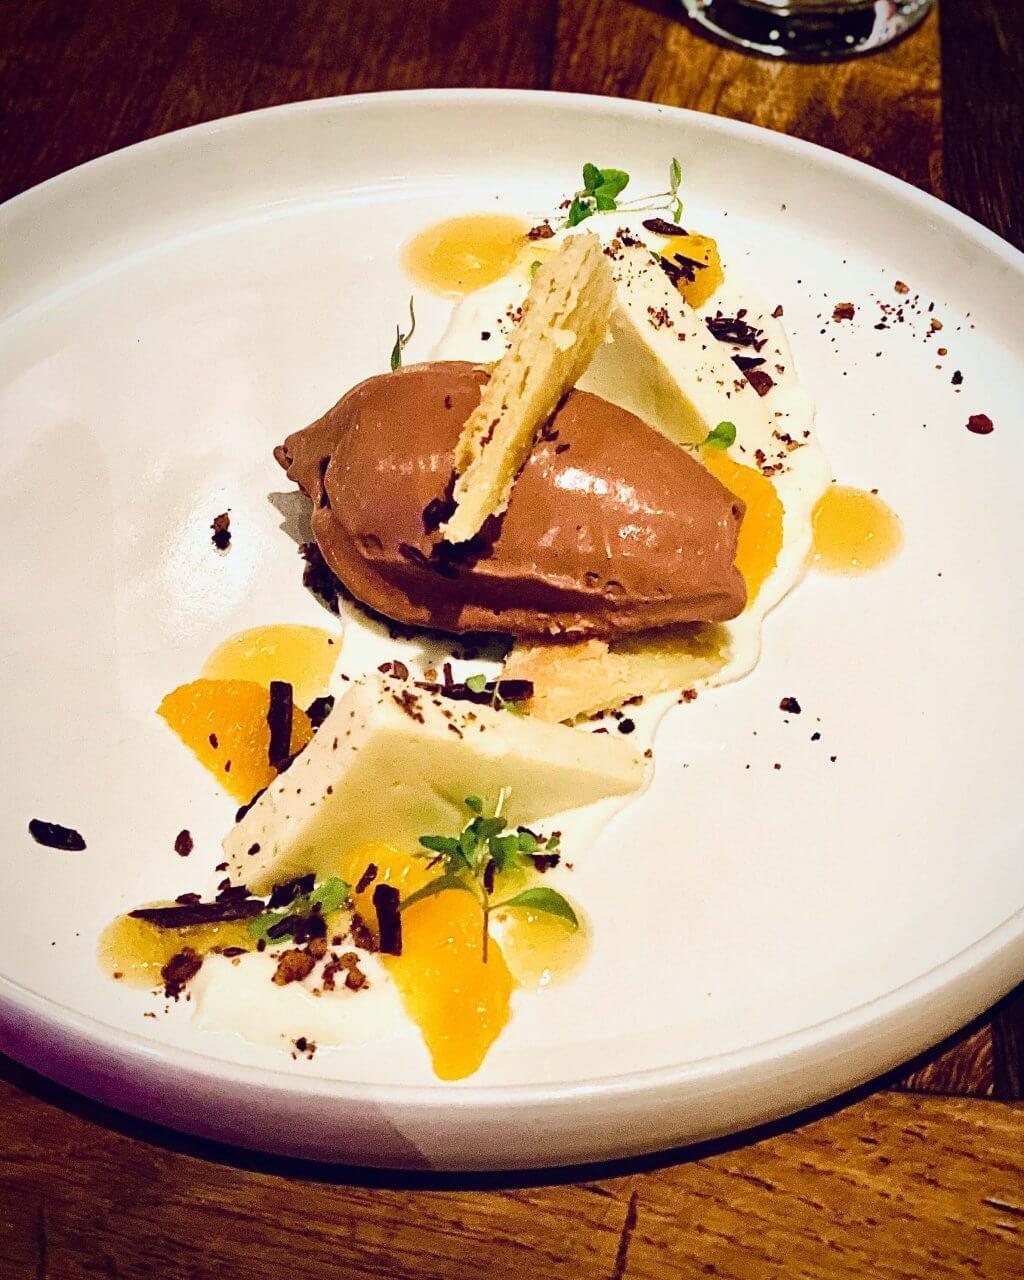 Bullerei - Dessert